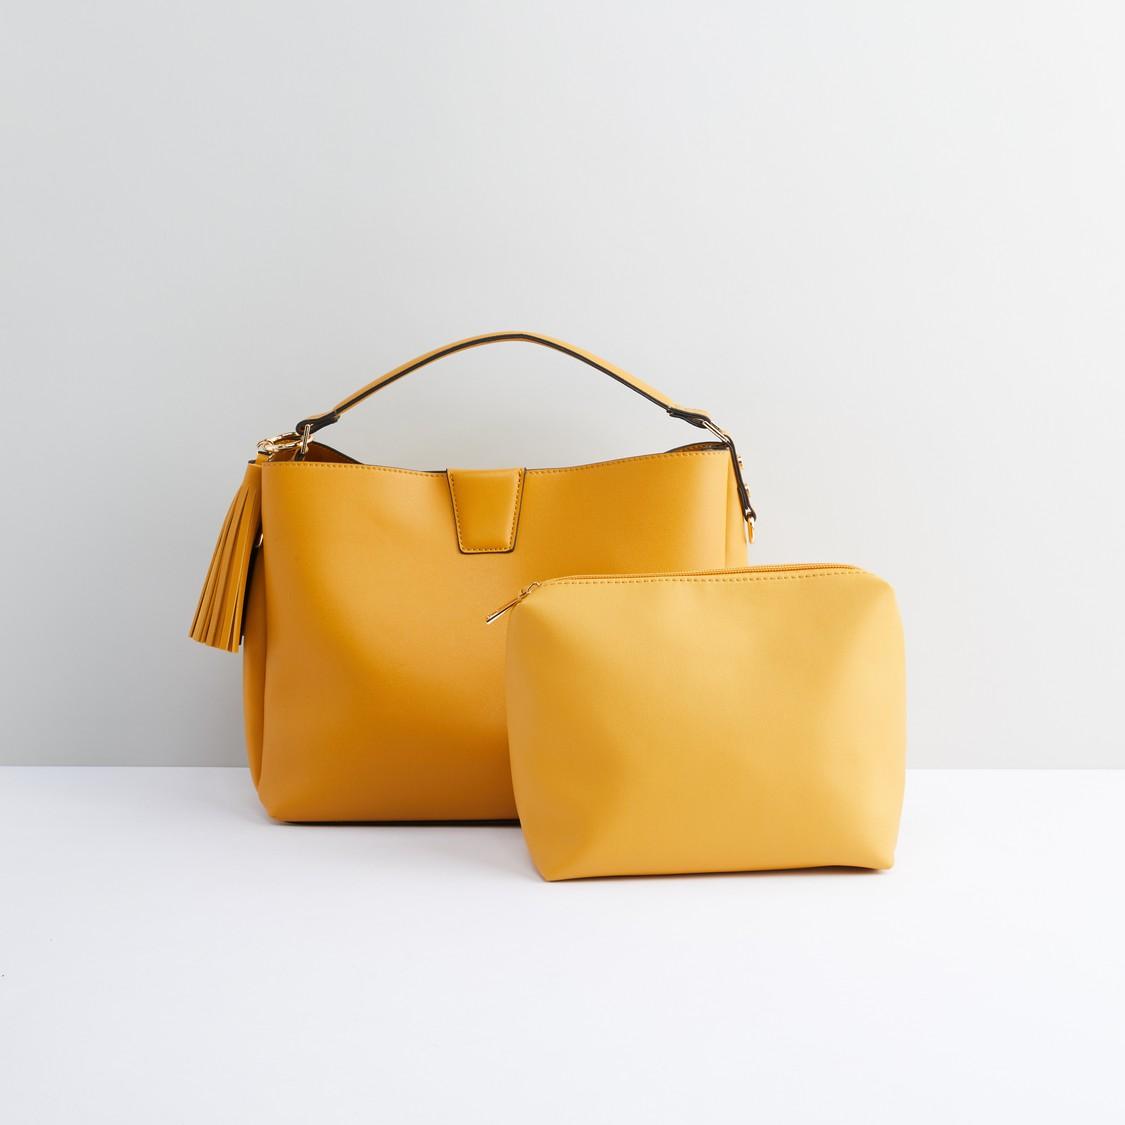 حقيبة يد بشُرّابات مع حقيبة صغيرة